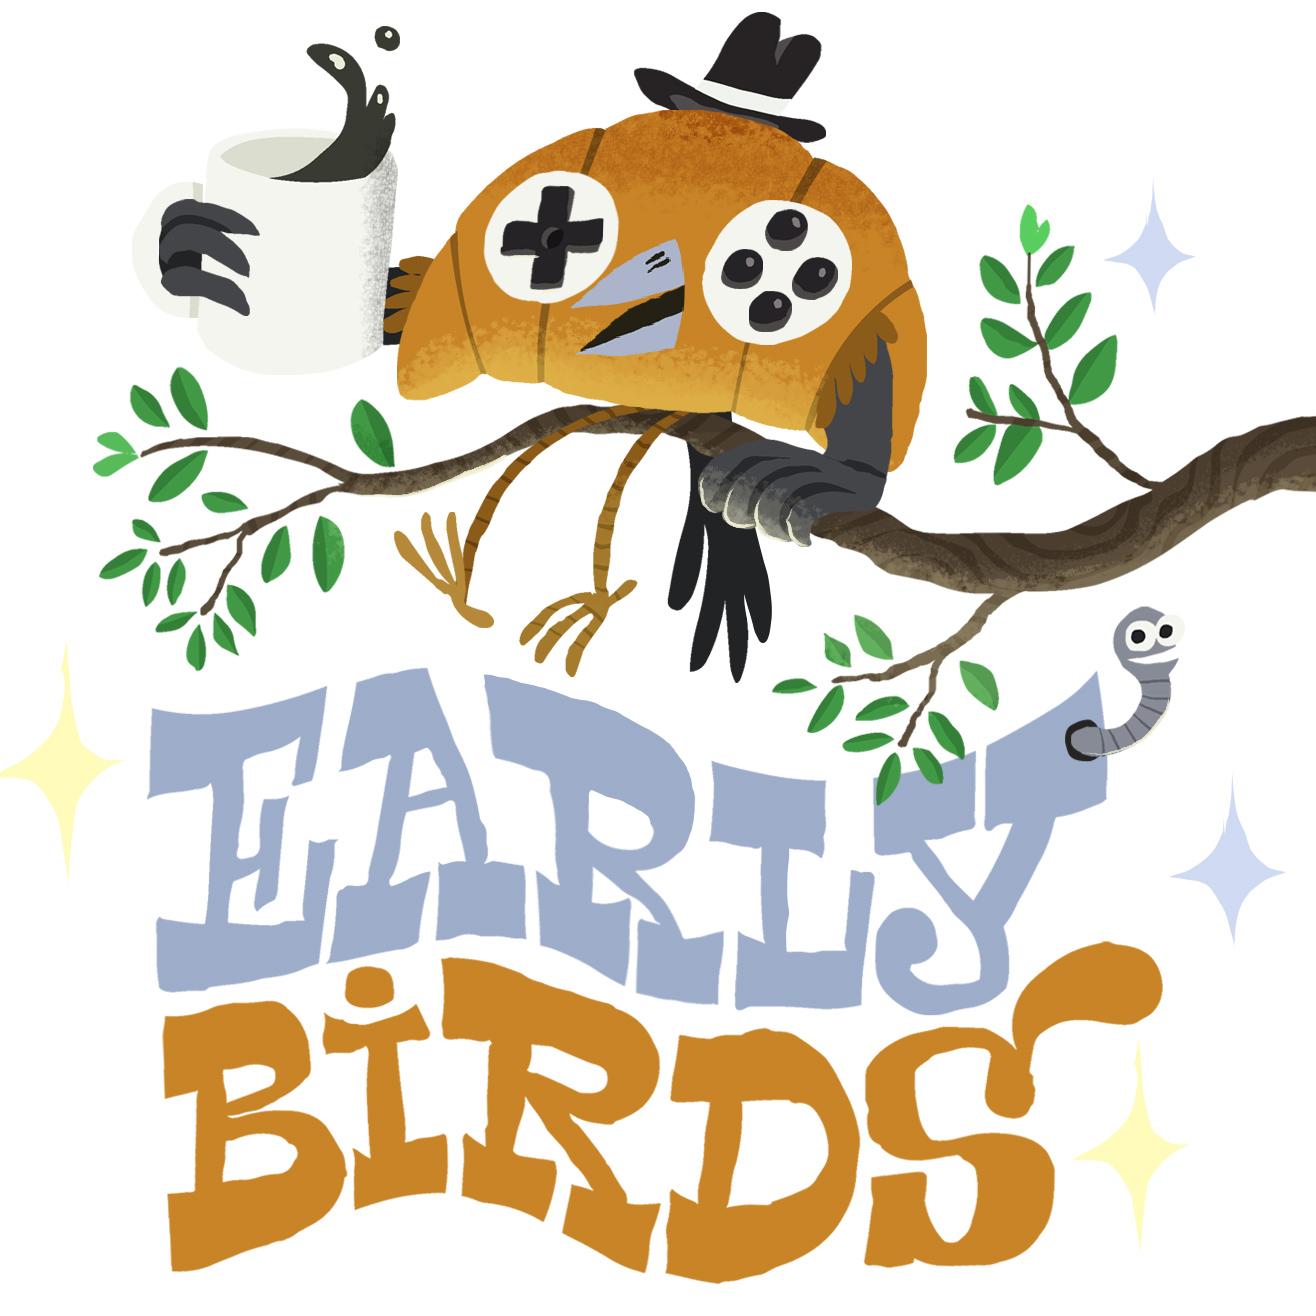 Early Birds - Unser neues Format rund um die Faszination Early Access